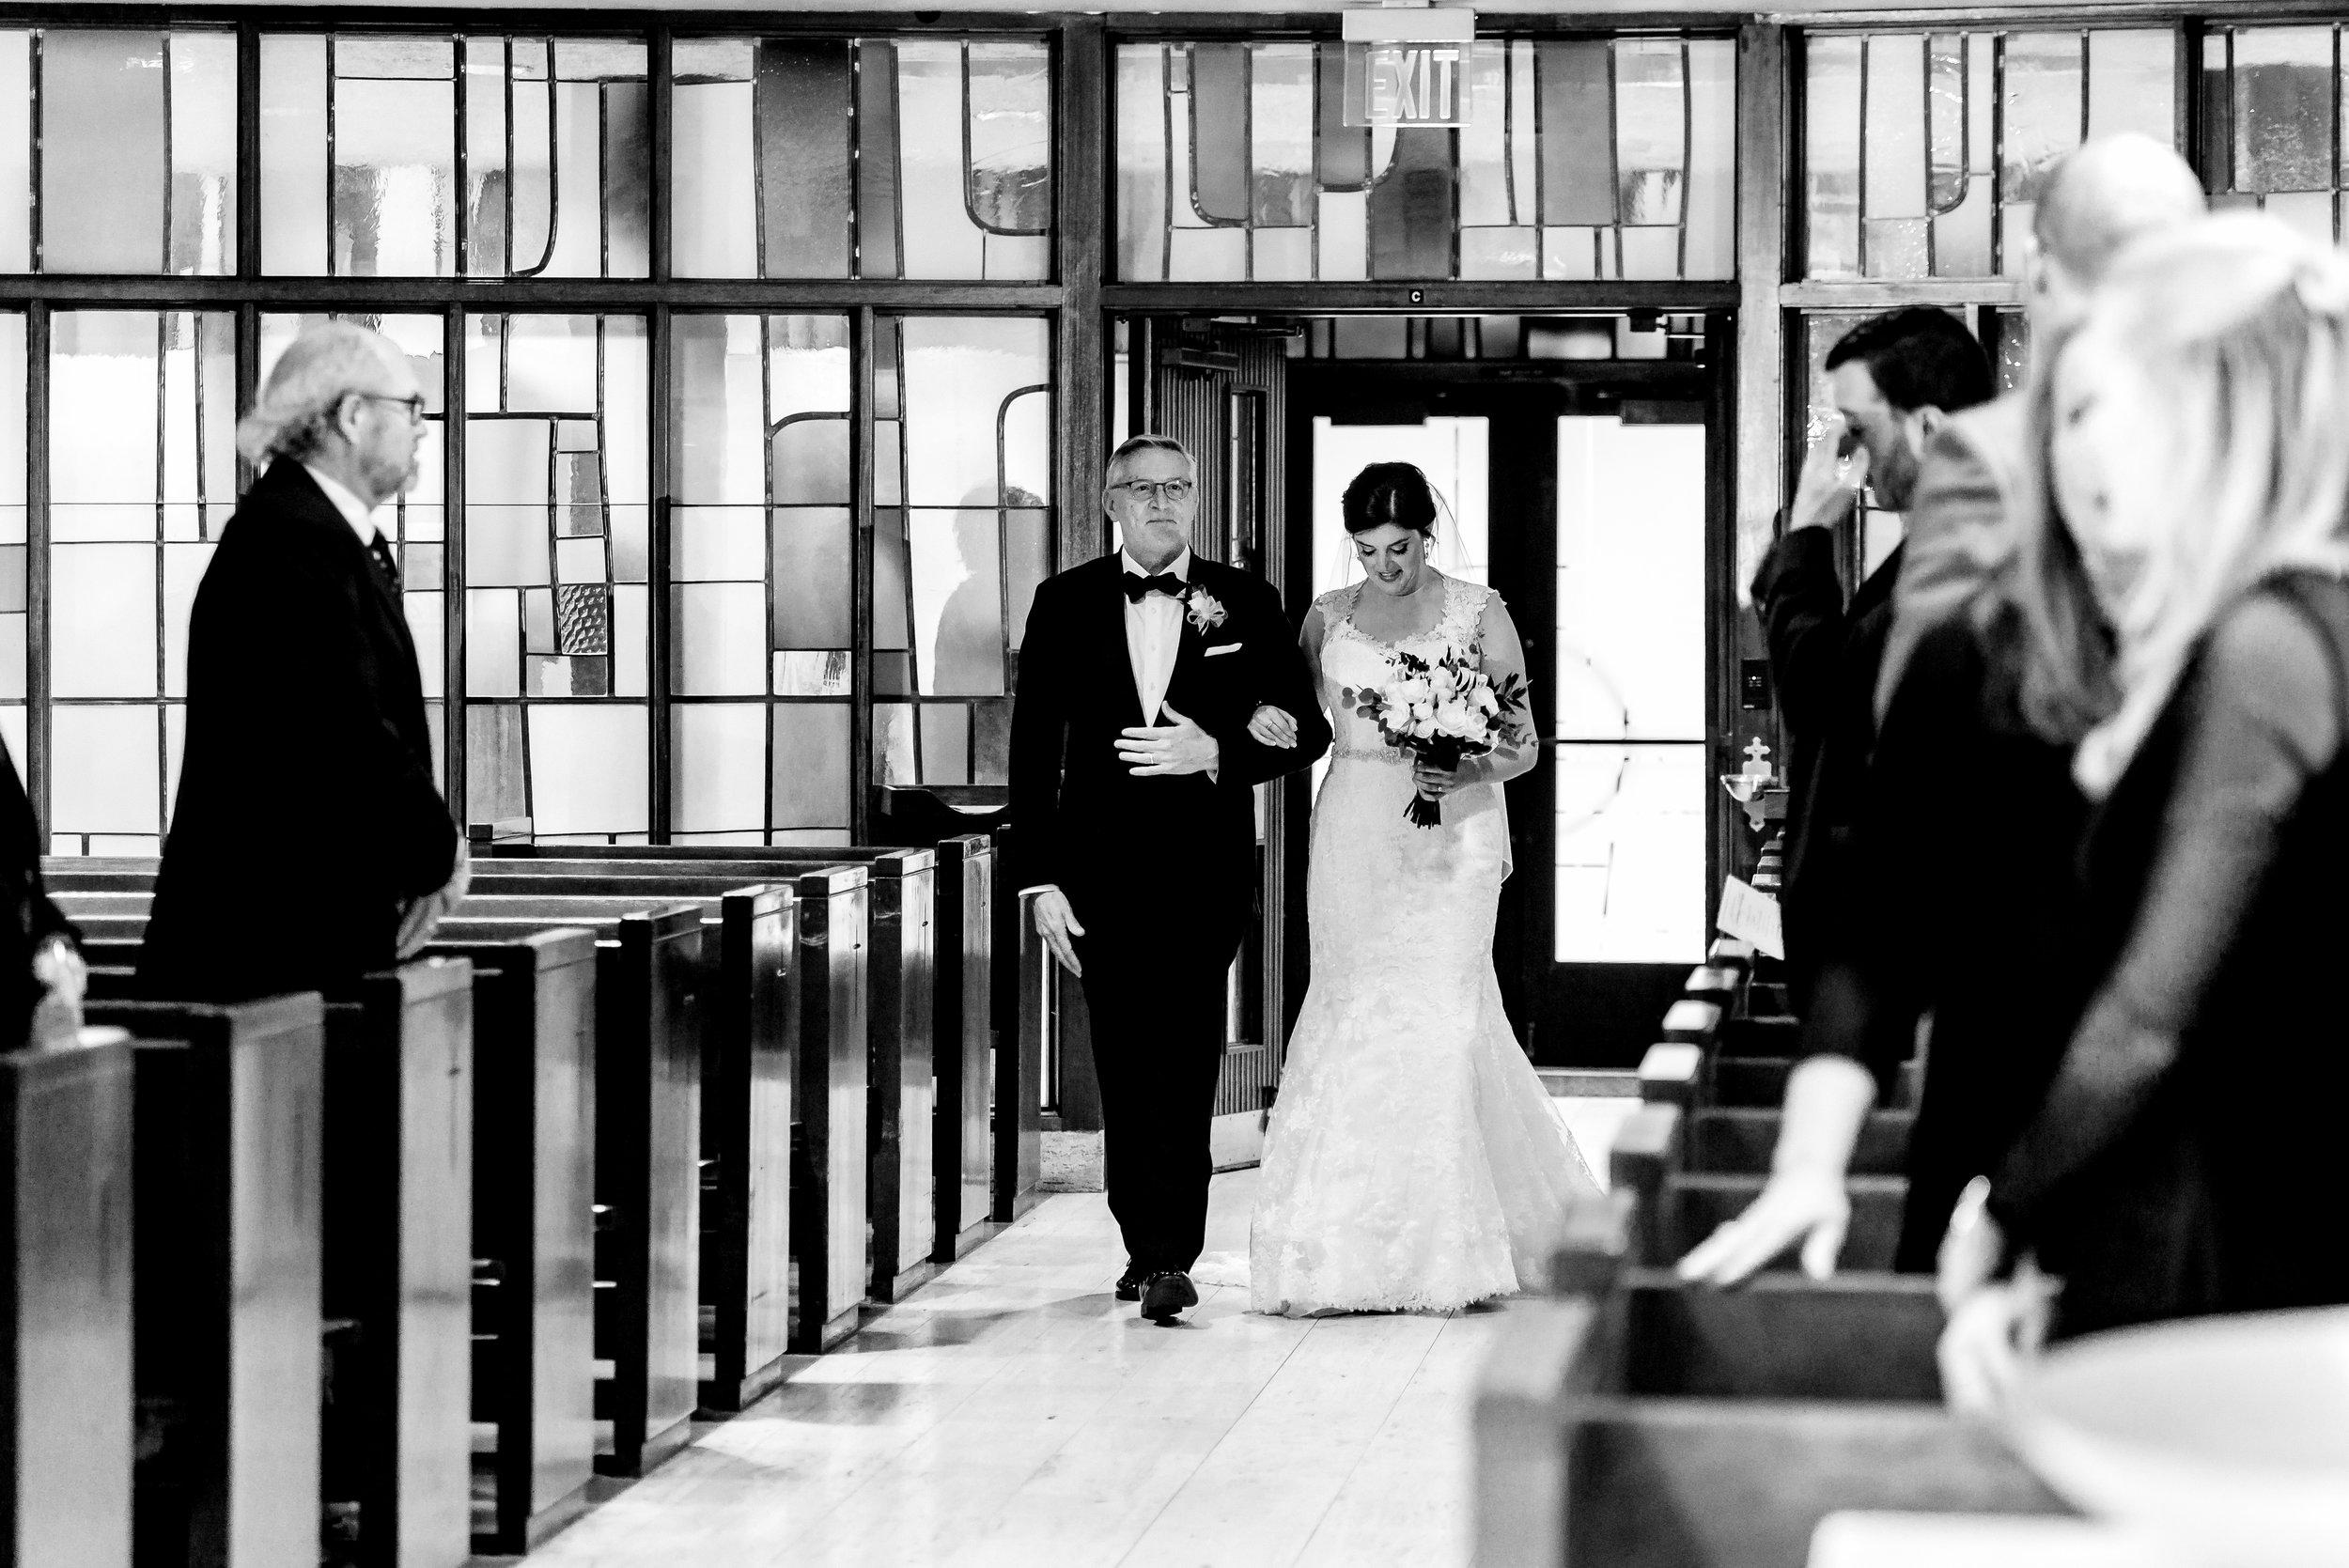 Classic Bridal Entrance at Saint Olaf Catholic Church - Classic Black Tie Wedding in Minneapolis - Best Wedding Photographers MN